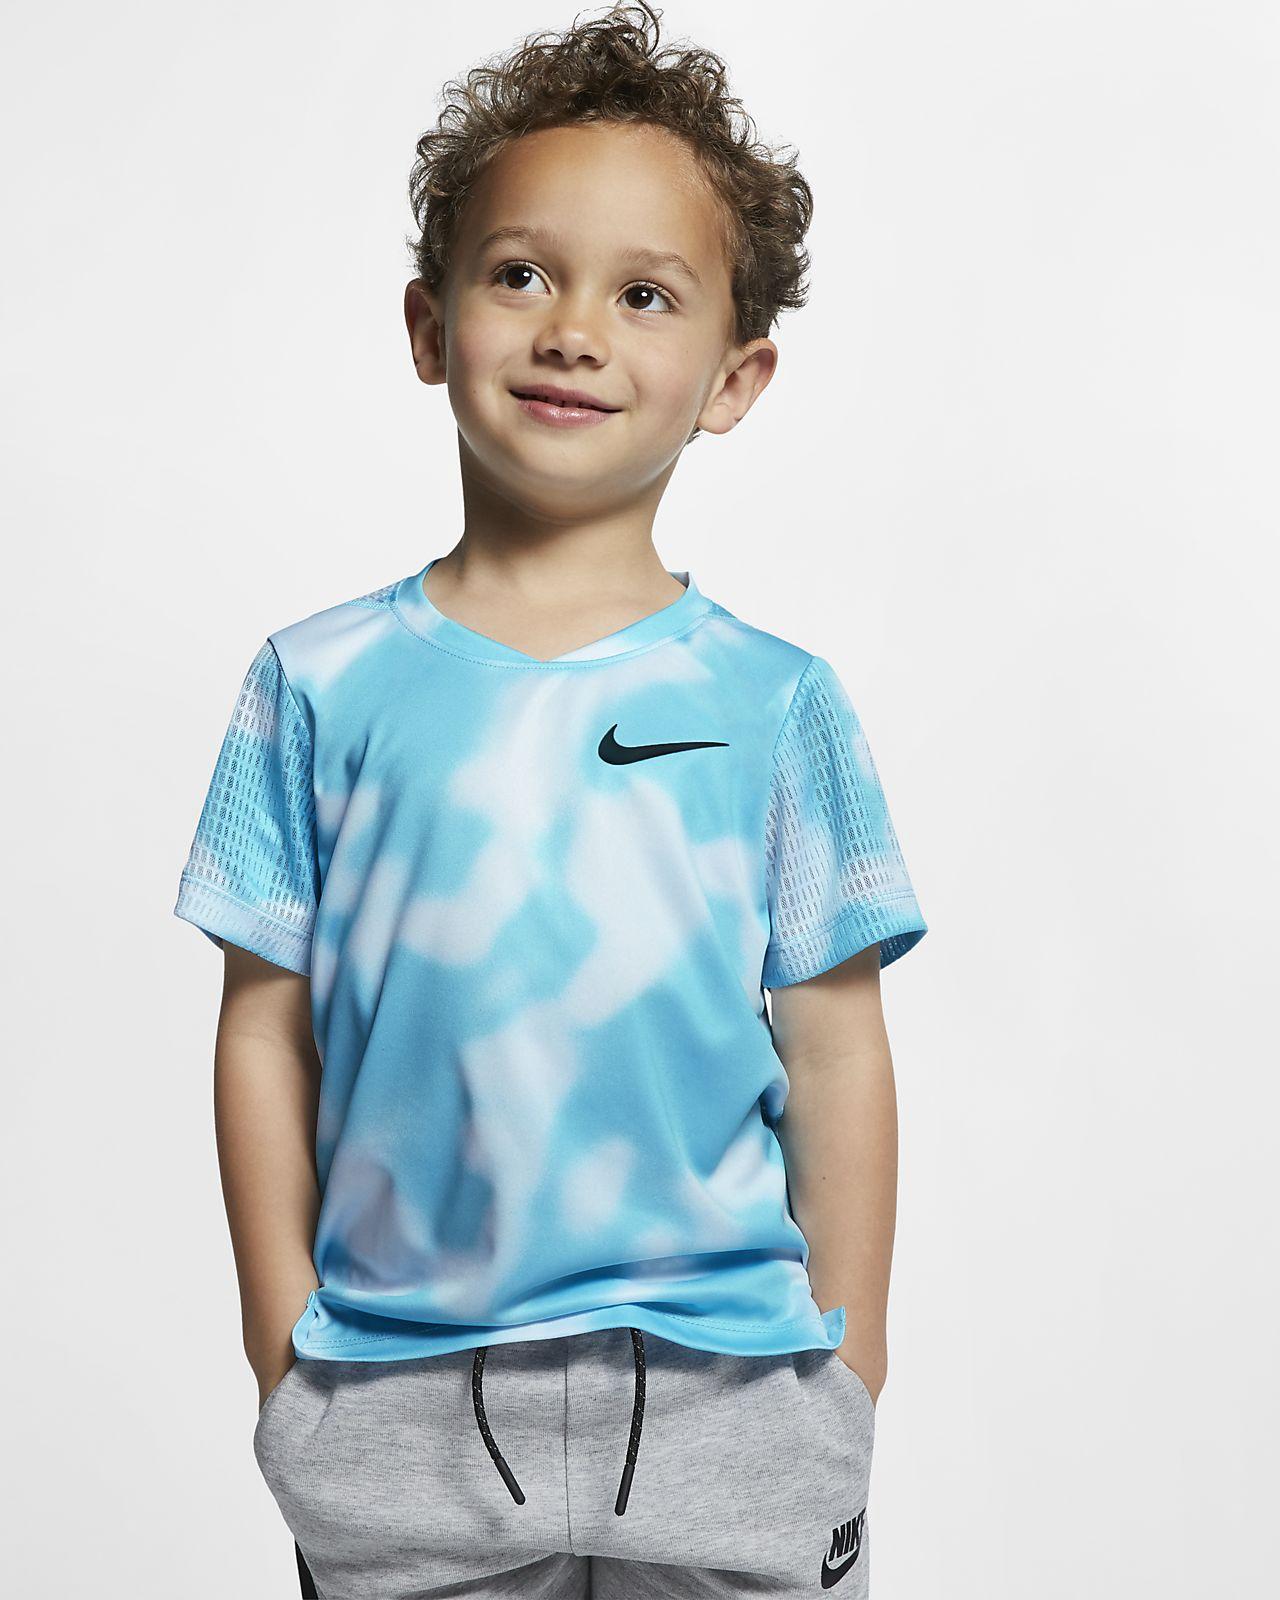 Nike Dri-FIT felső gyerekeknek